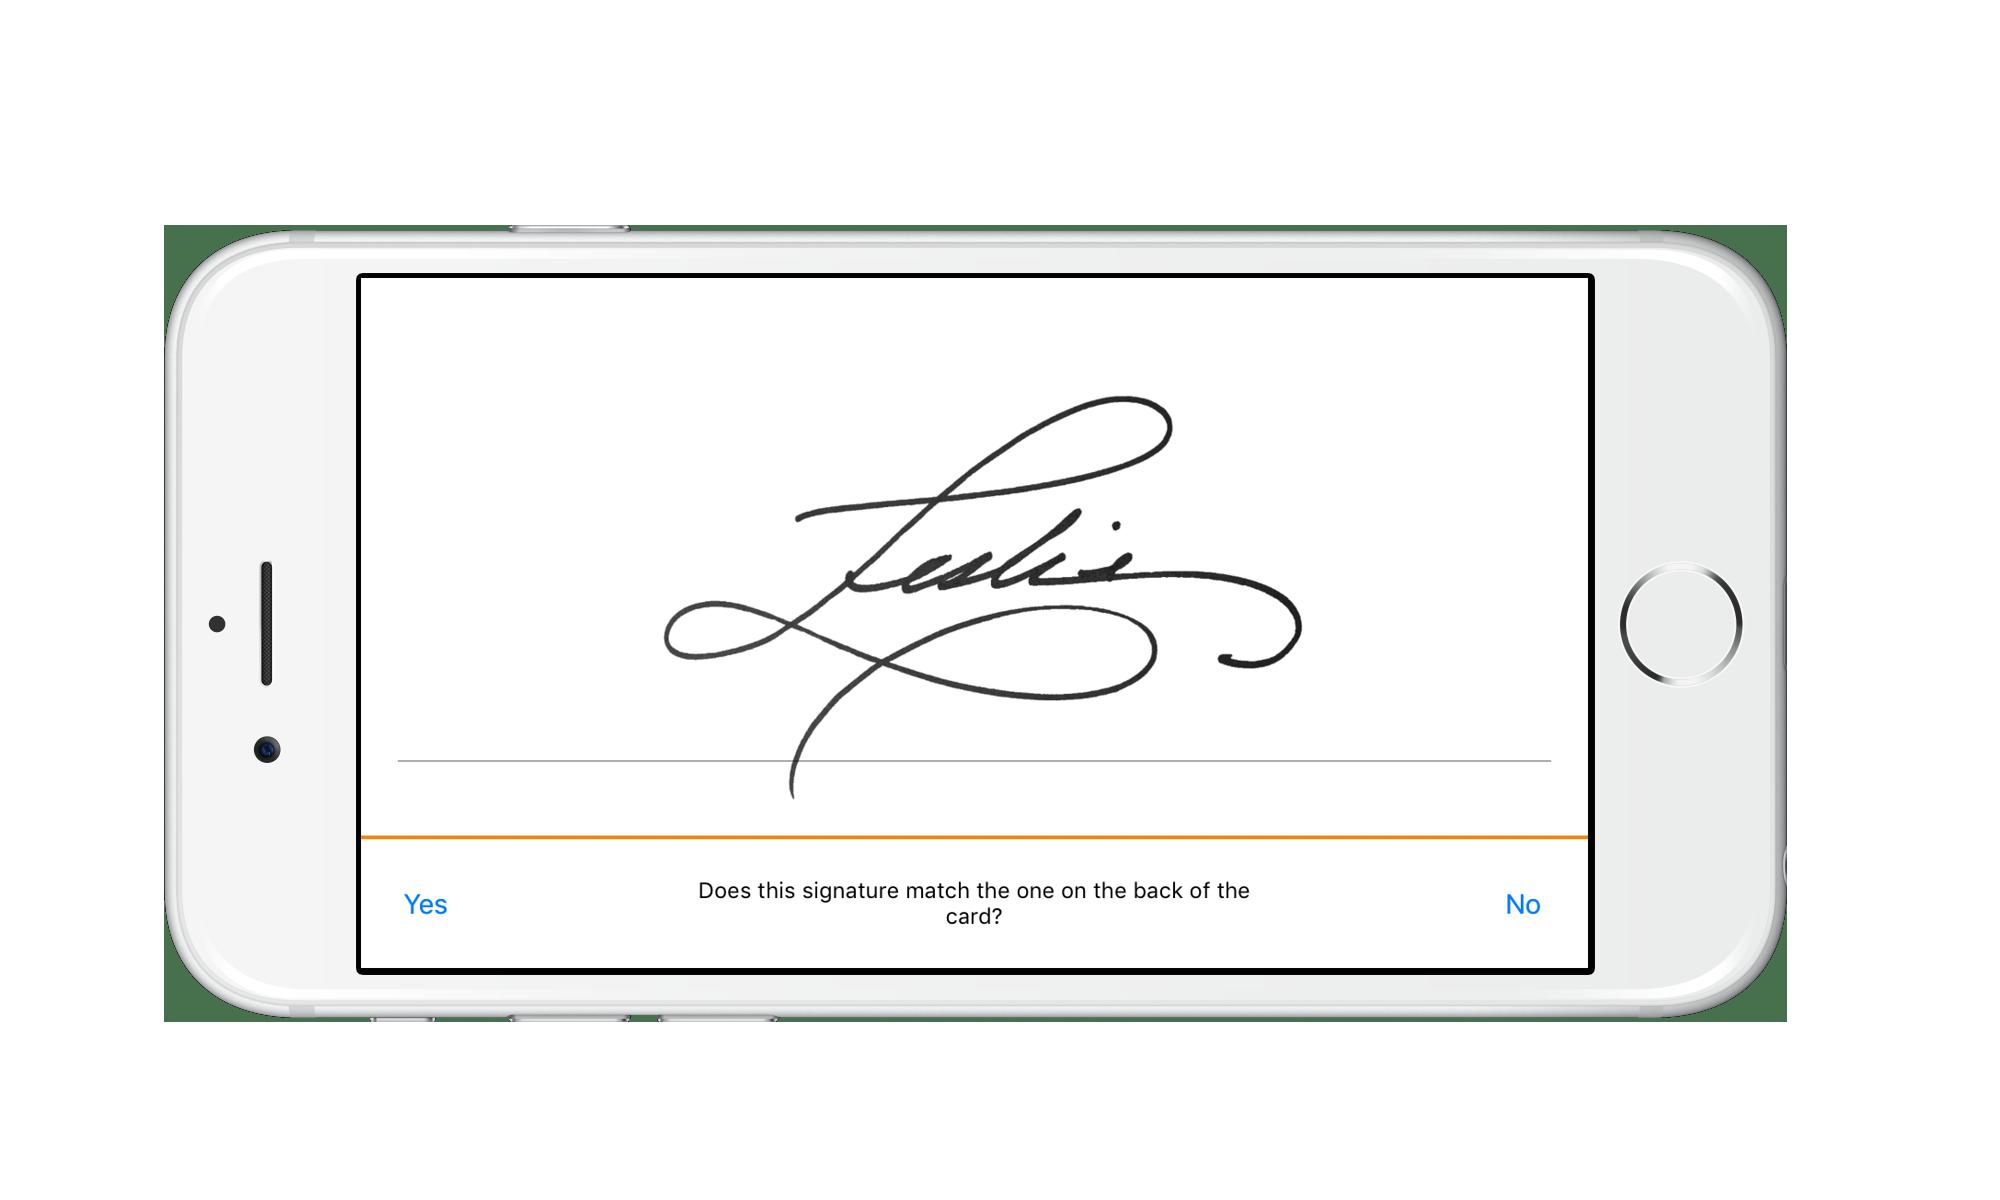 Signature verification screen